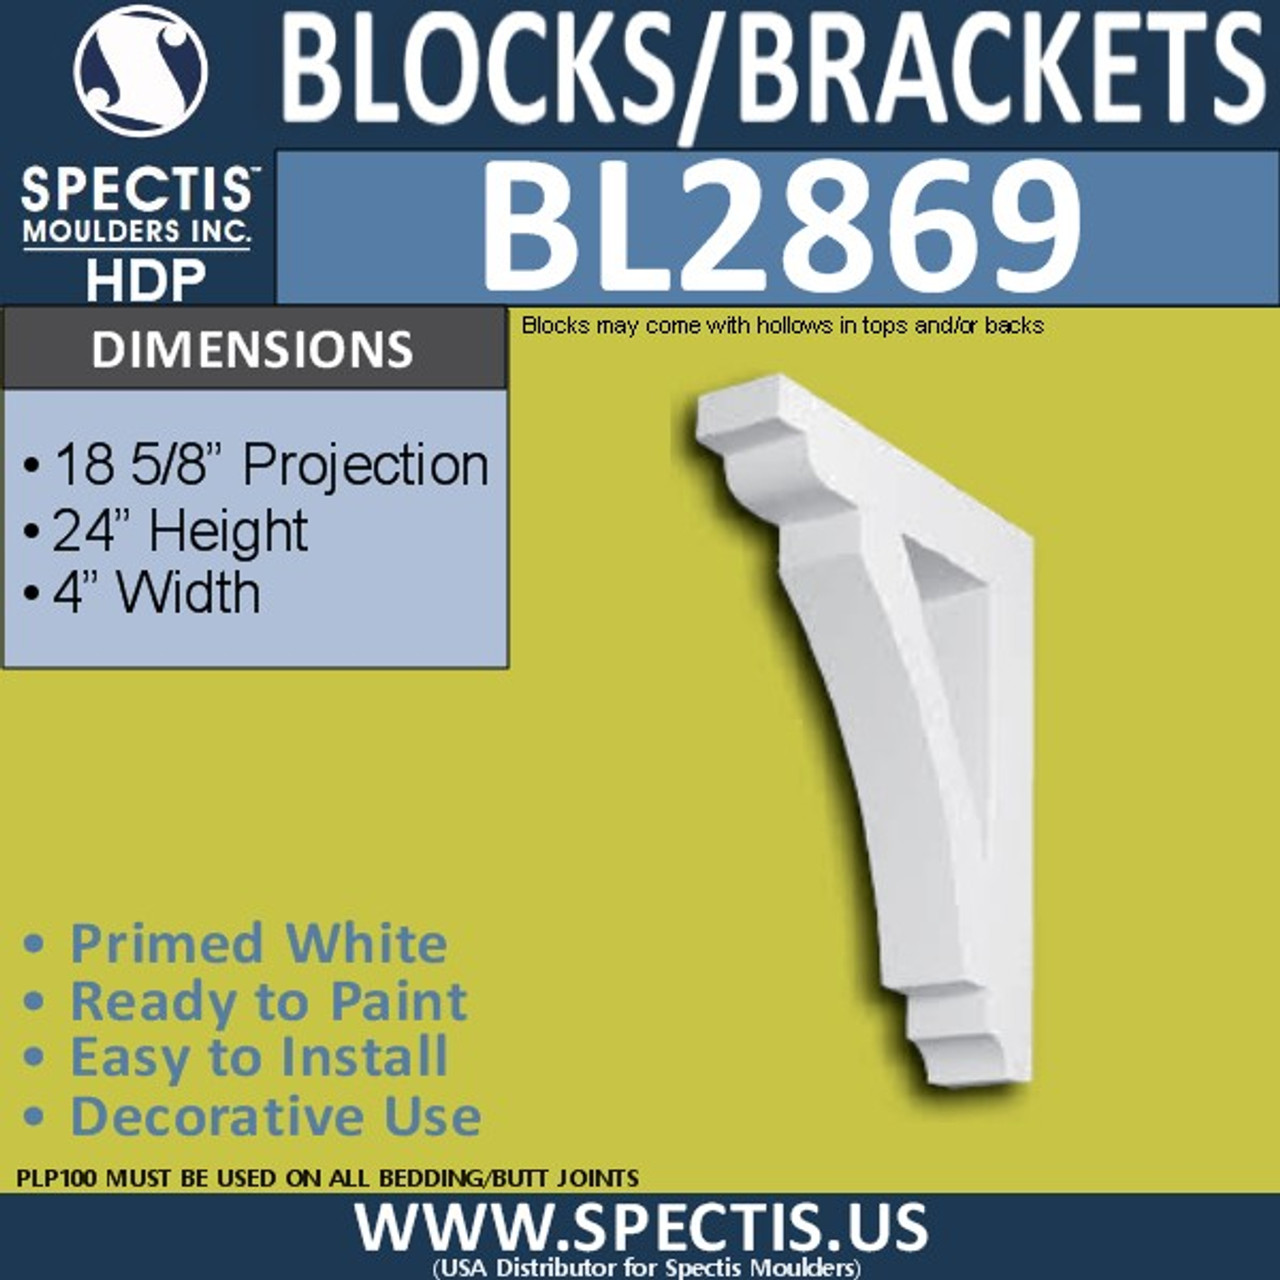 "BL2869 Eave Block or Bracket 4""W x 24""H x 18.5"" P"